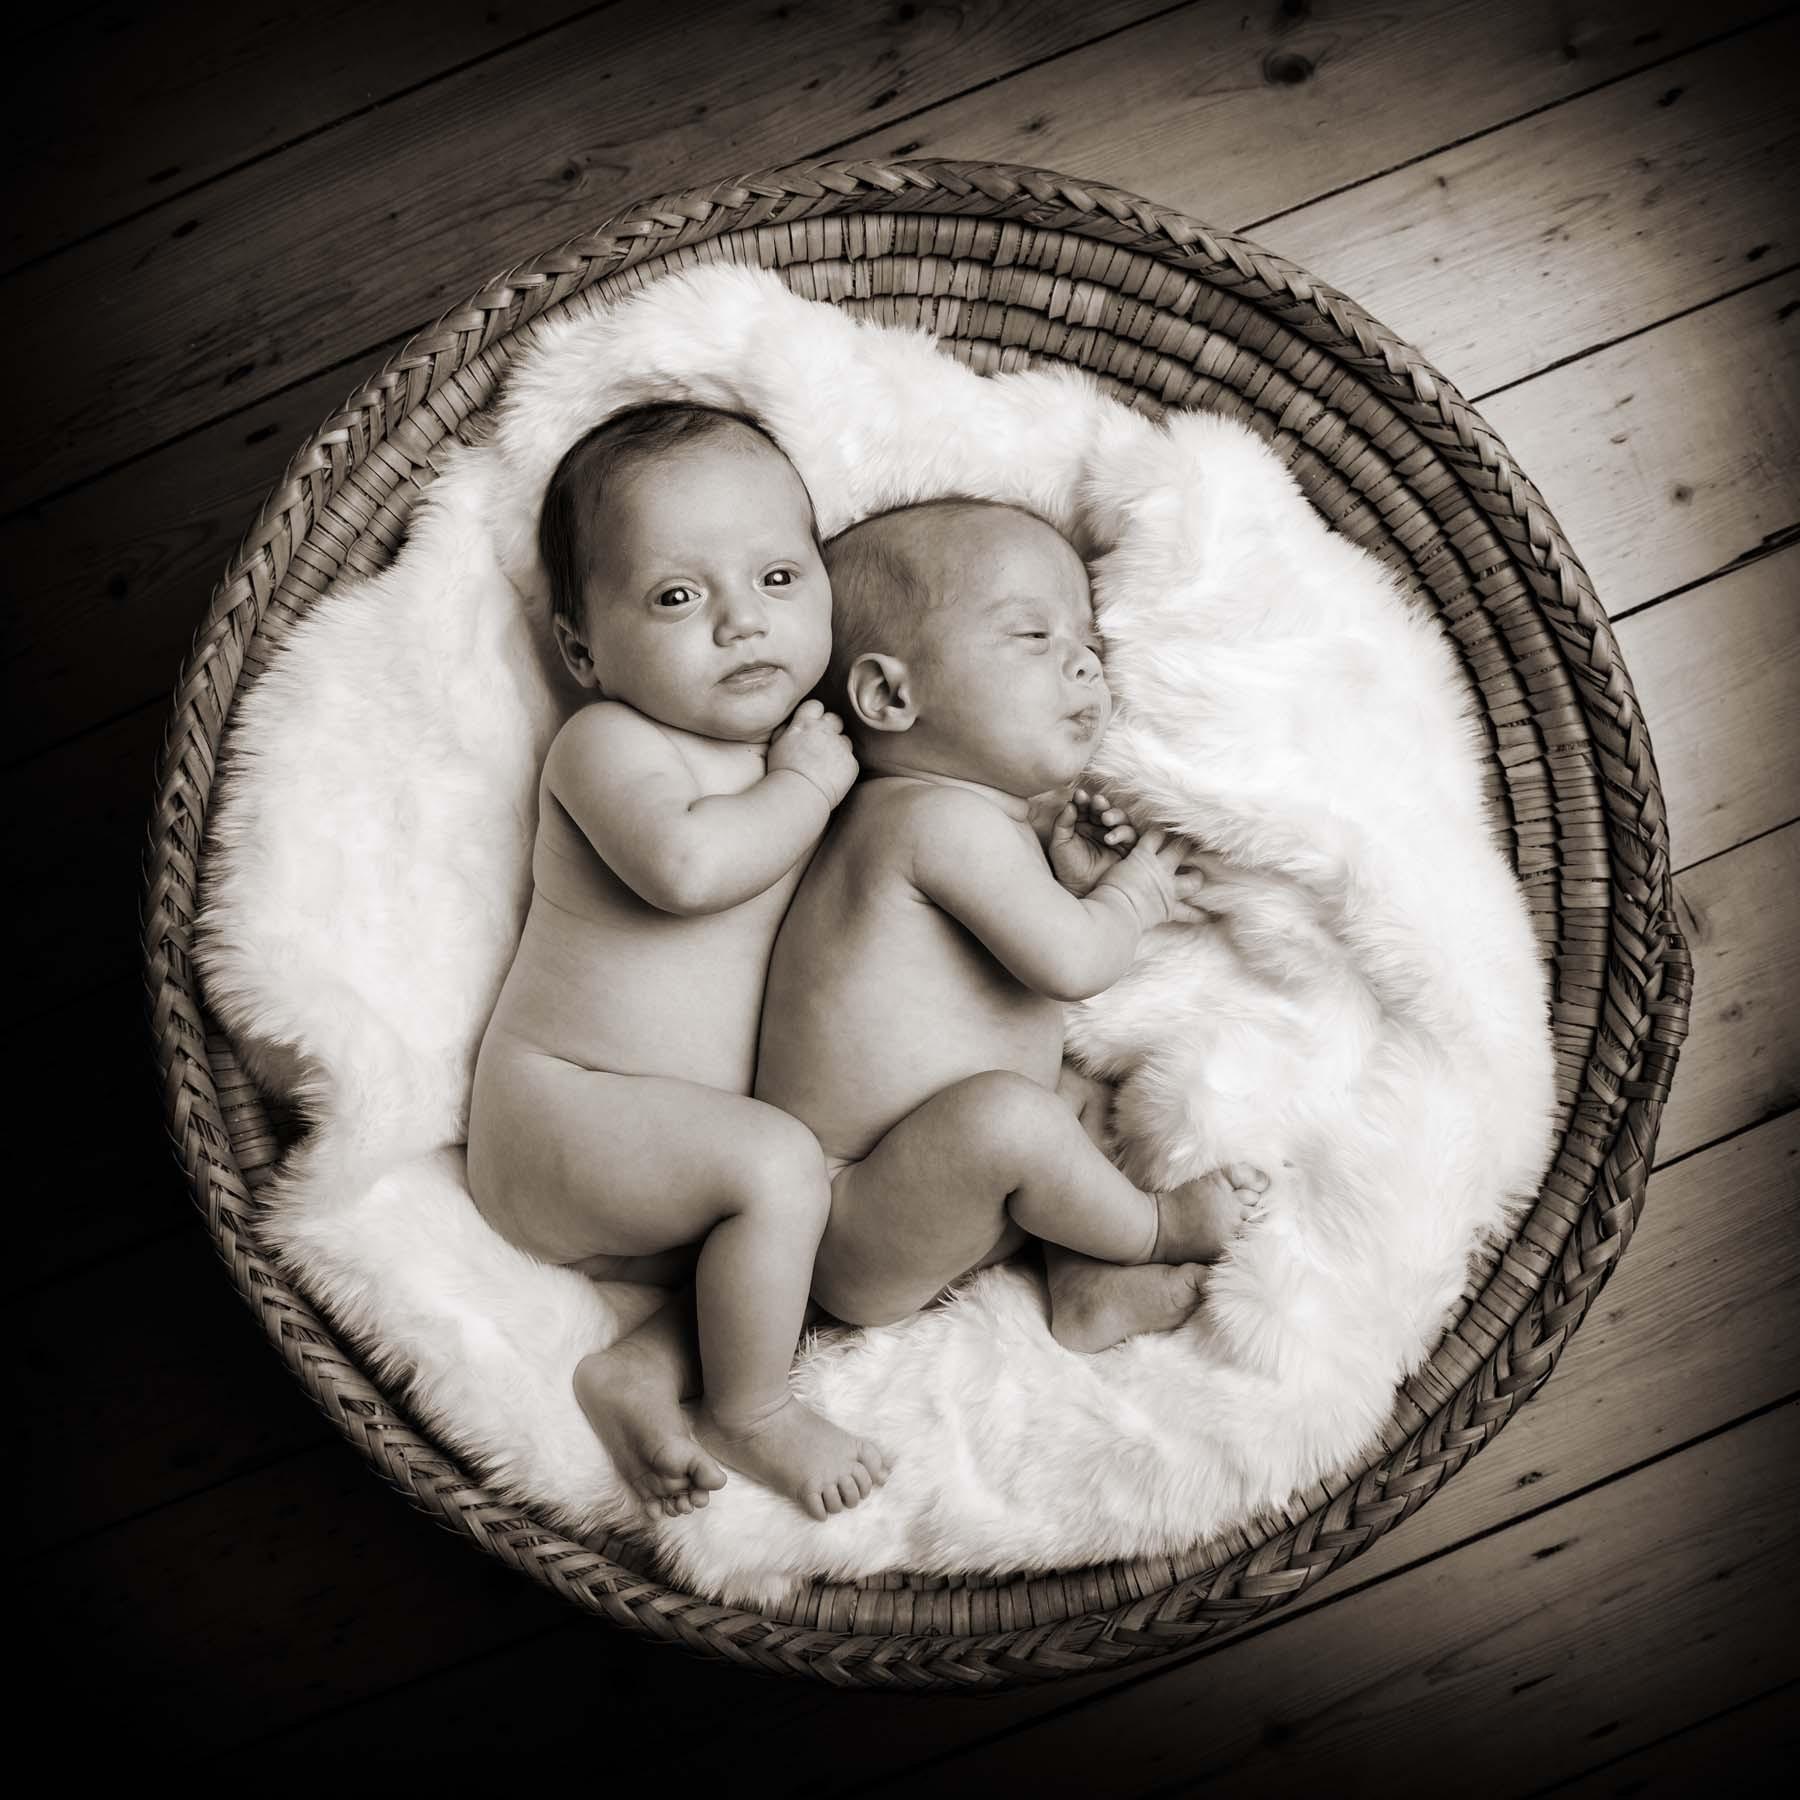 Newborn Baby Photographer in Sussex & Surrey, East Grinstead & Crawley (17)